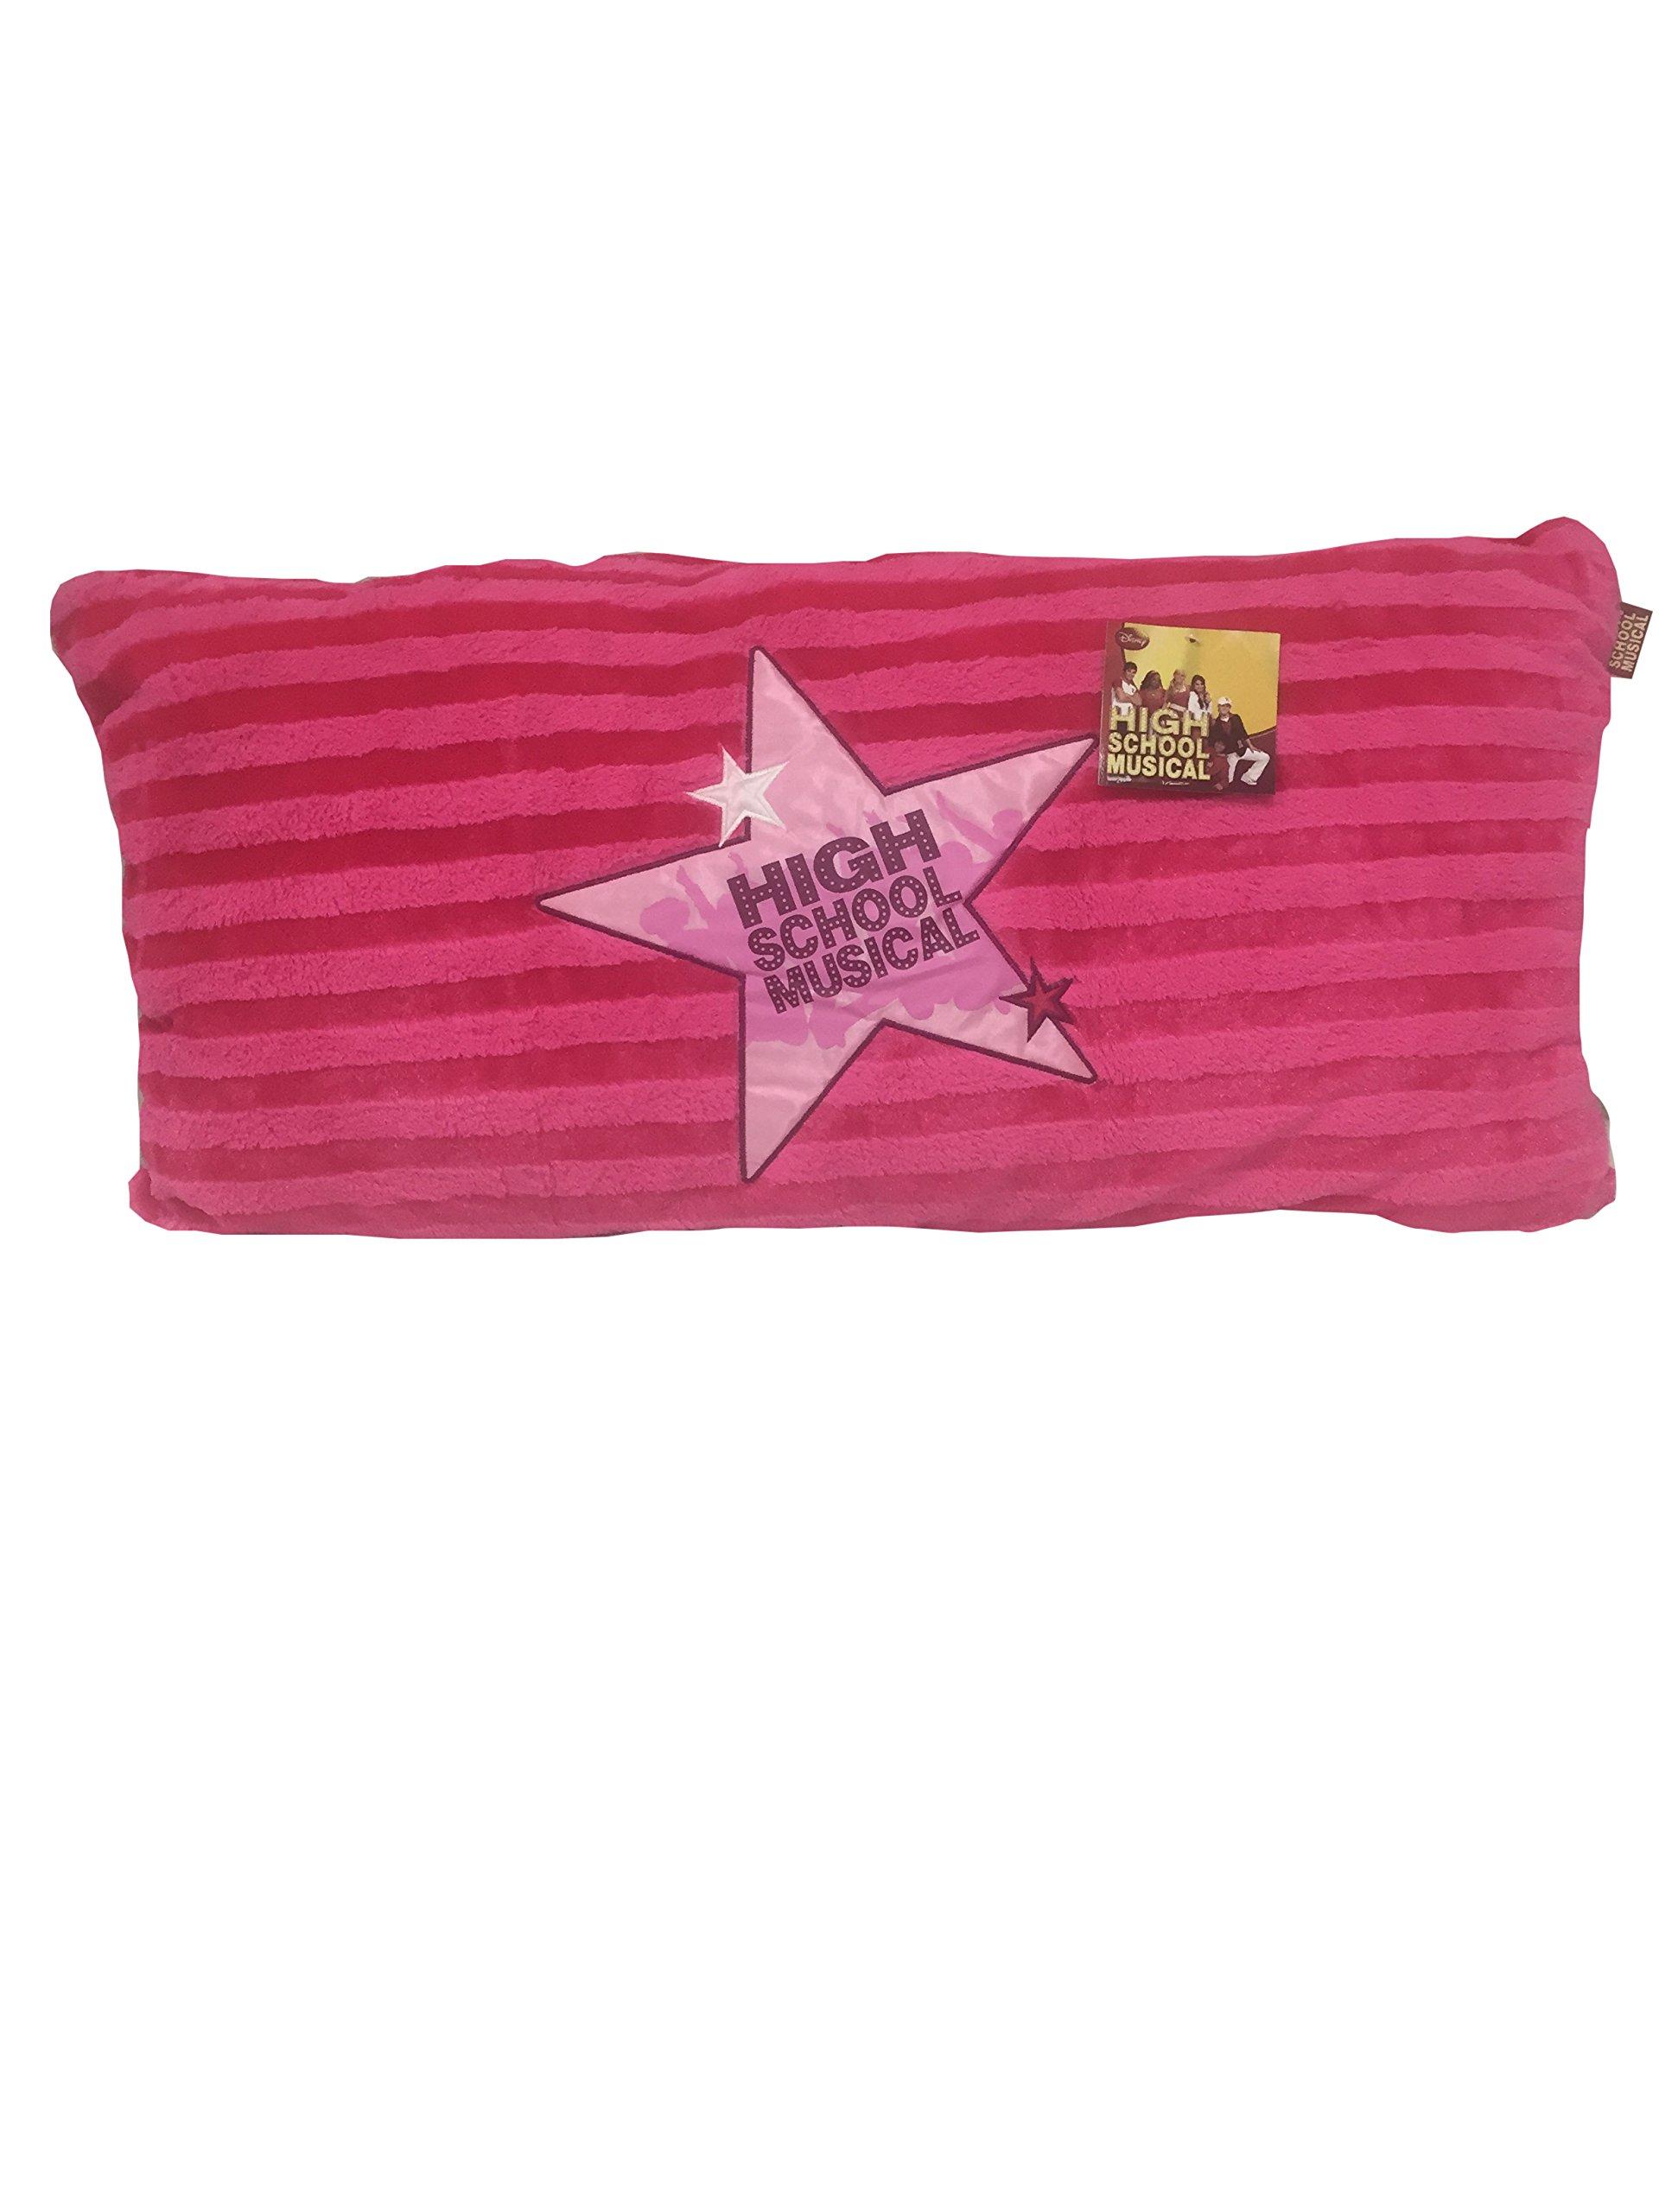 High School Musical Luxuriously Soft Body Pillow 17''x34''